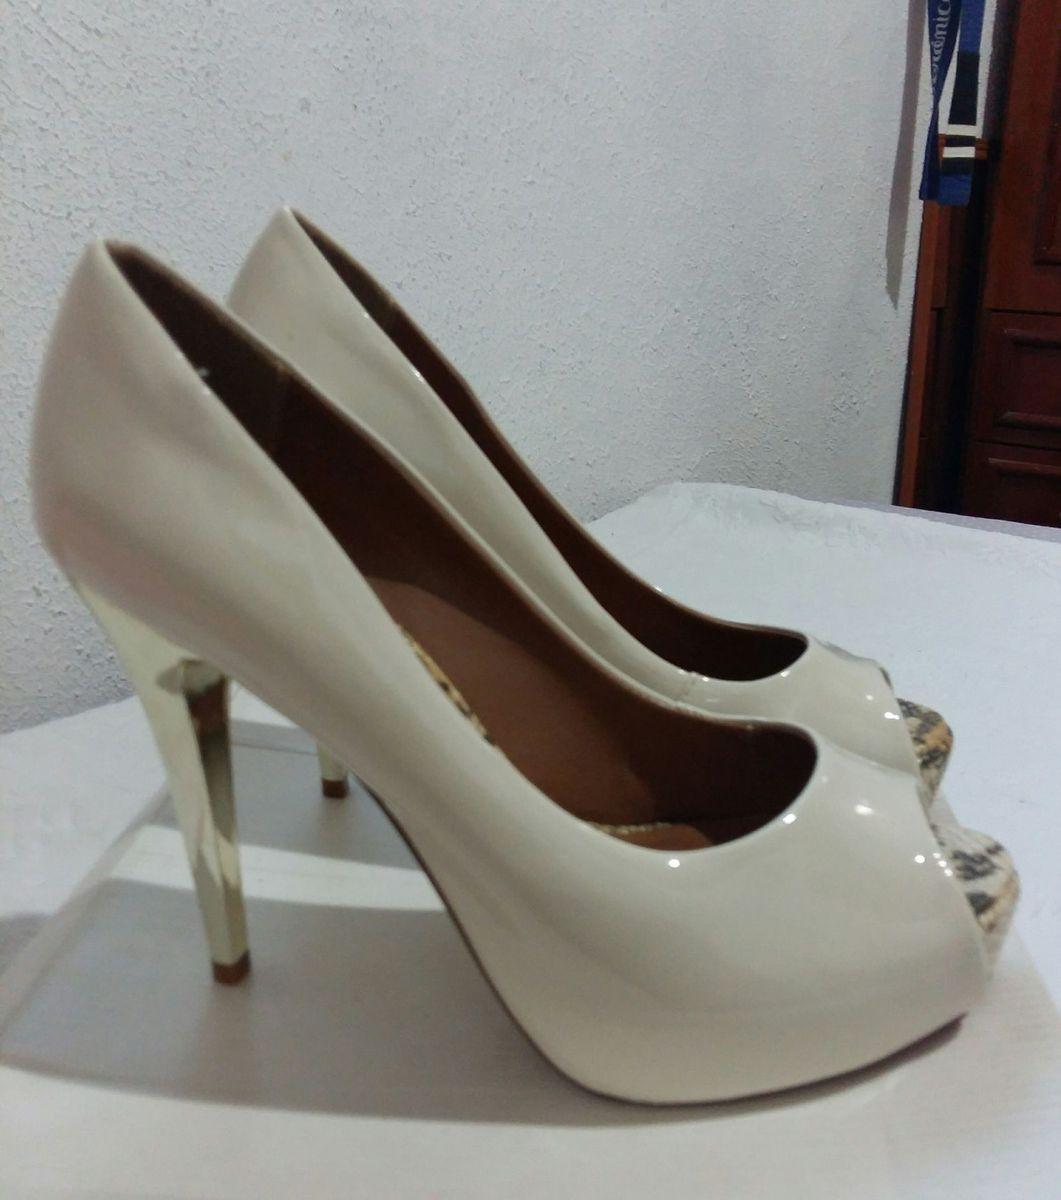 26de67e8b4 sapato noiva - sapatos rosamango.  Czm6ly9wag90b3muzw5qb2vplmnvbs5ici9wcm9kdwn0cy8xnjiymjyvogzjmme1mthmngizmgm5zwq0mjuwmjzmmjvky2u5nmiuanbn